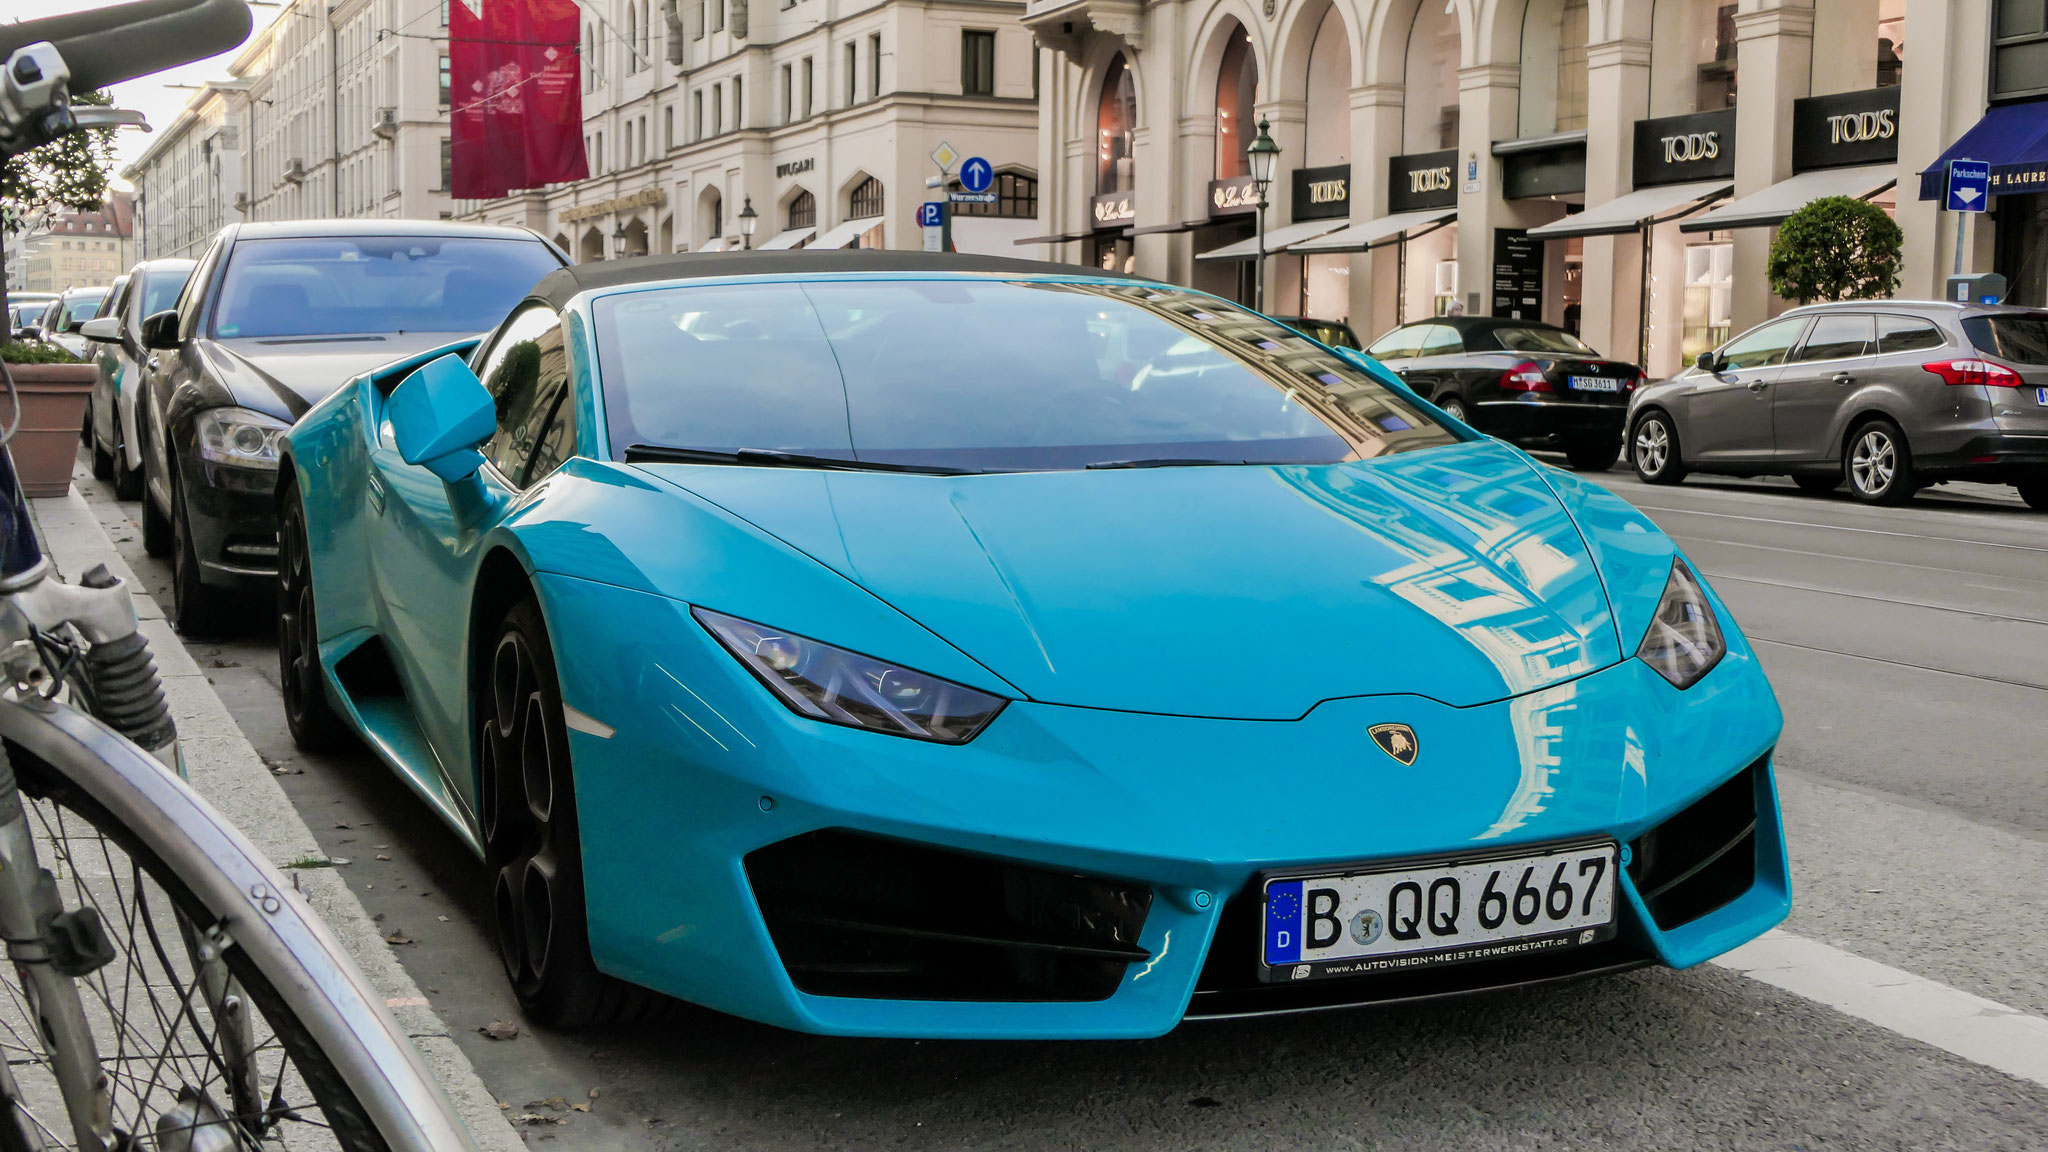 Lamborghini Huracan Spyder - B-QQ-6667